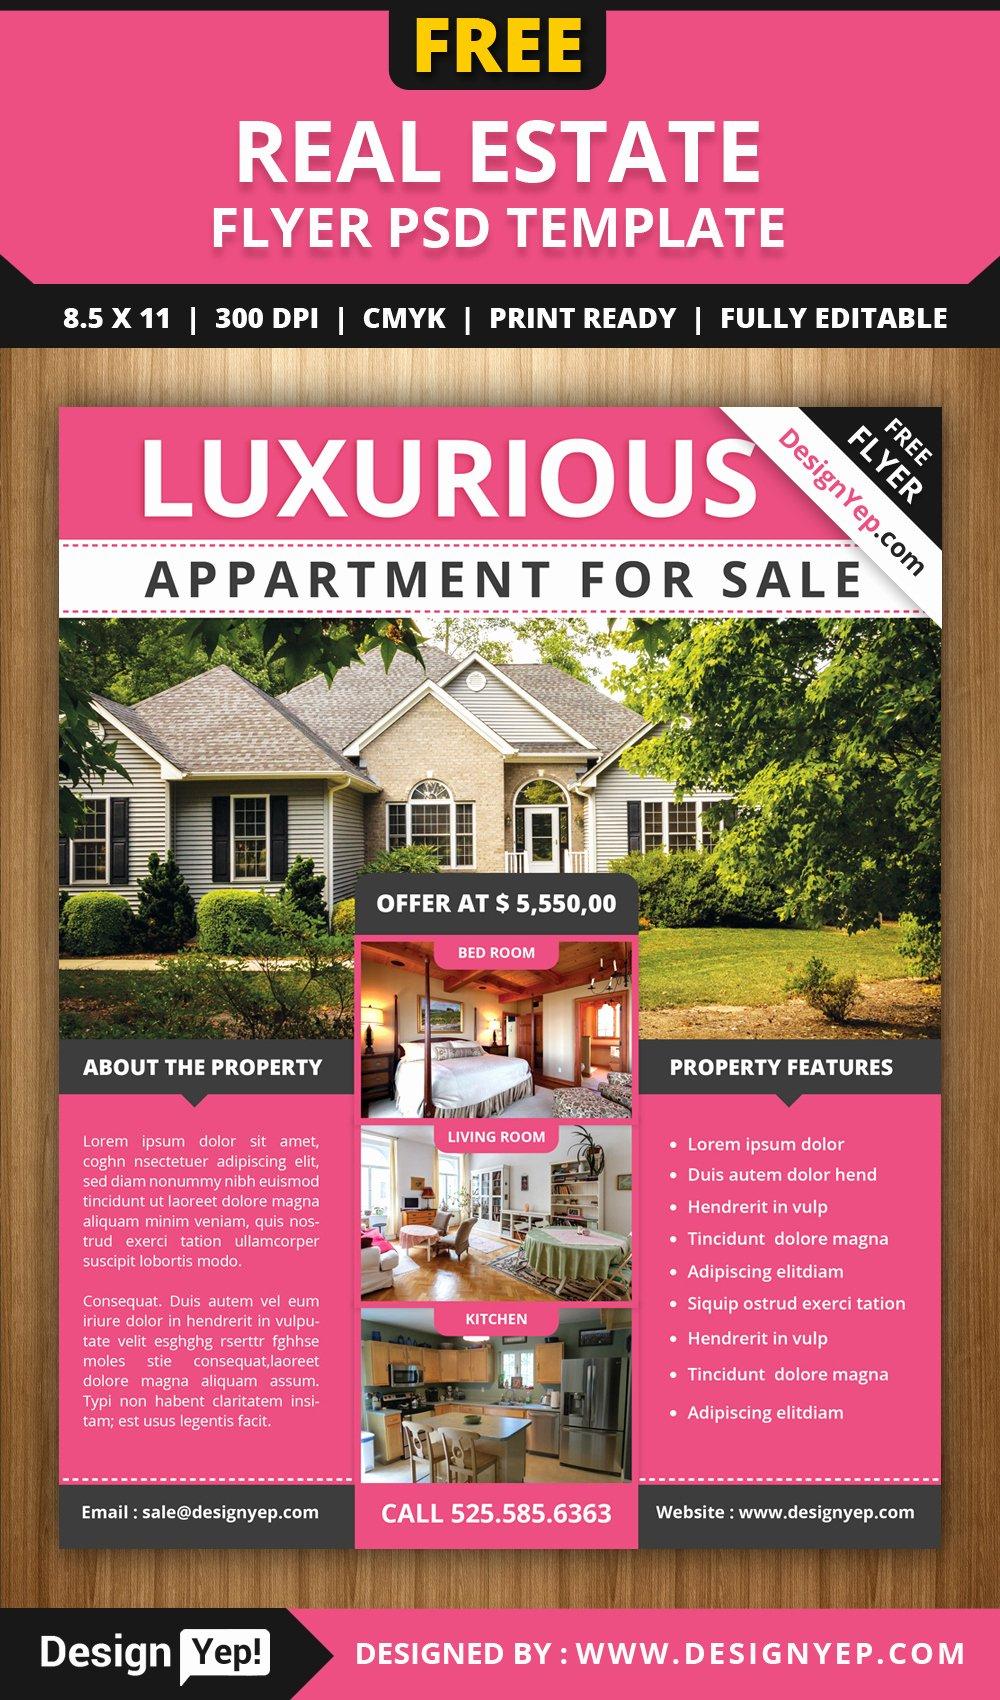 Free Real Estate Flyer Psd Template Designyep